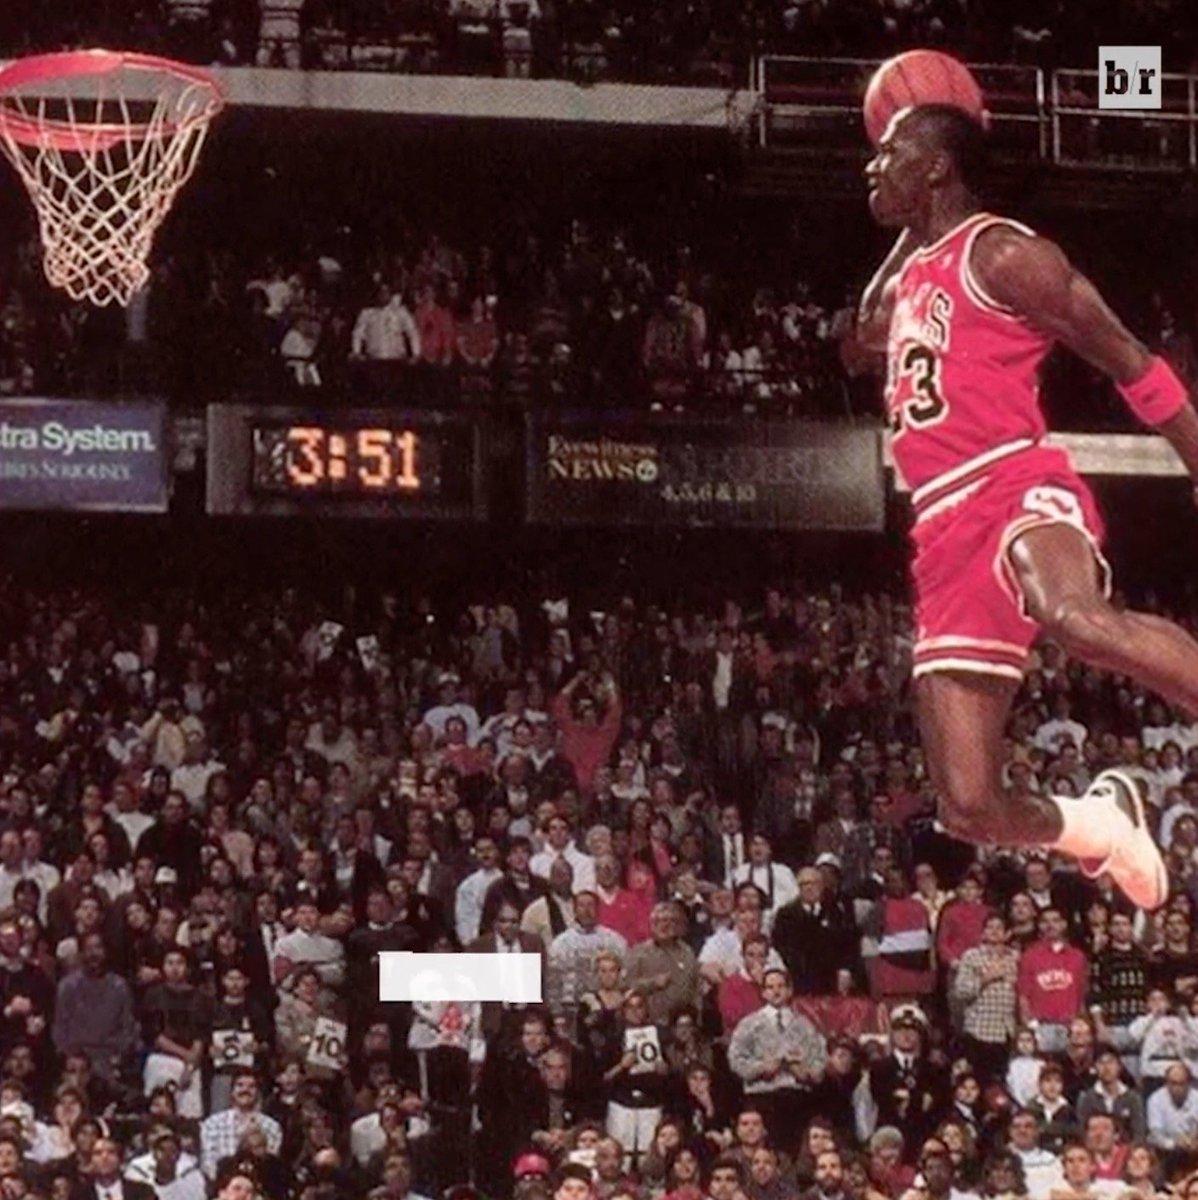 super jakość najlepsze buty 2018 buty Michael Jordan Airness : Michael Jordan Airness | Bleacher ...